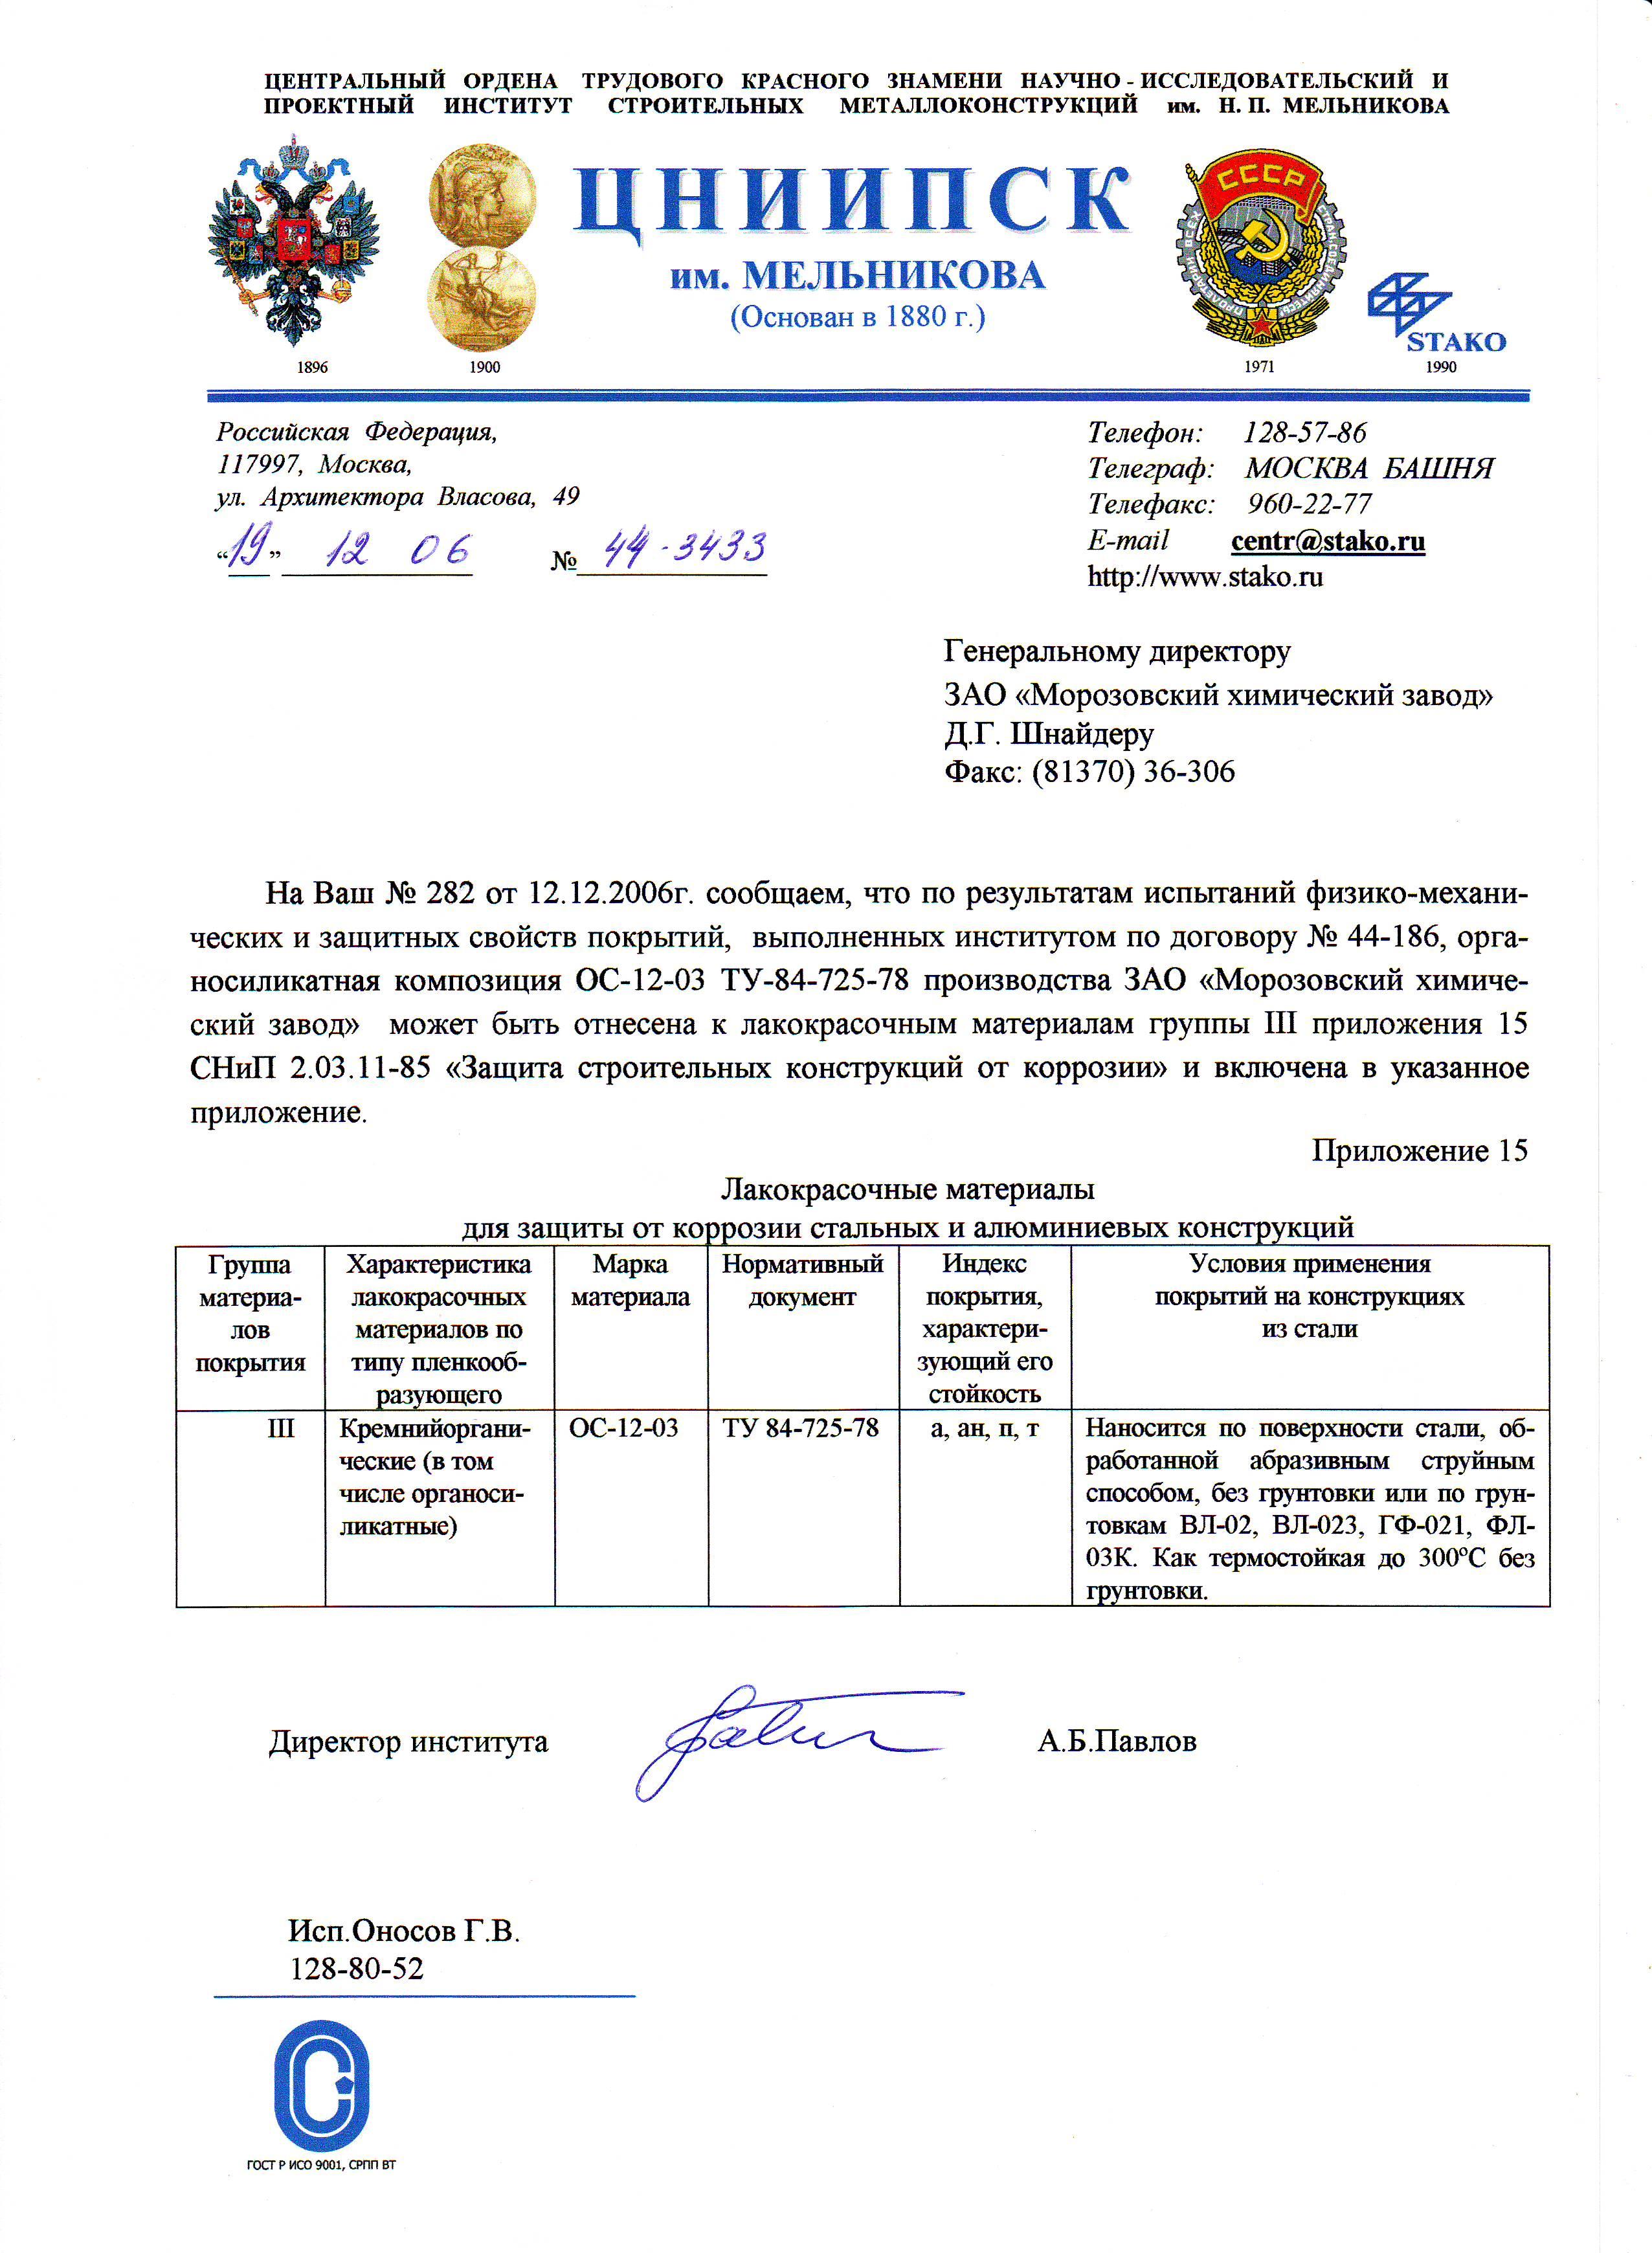 ЦНИИПСК им.Мельникова СНиП